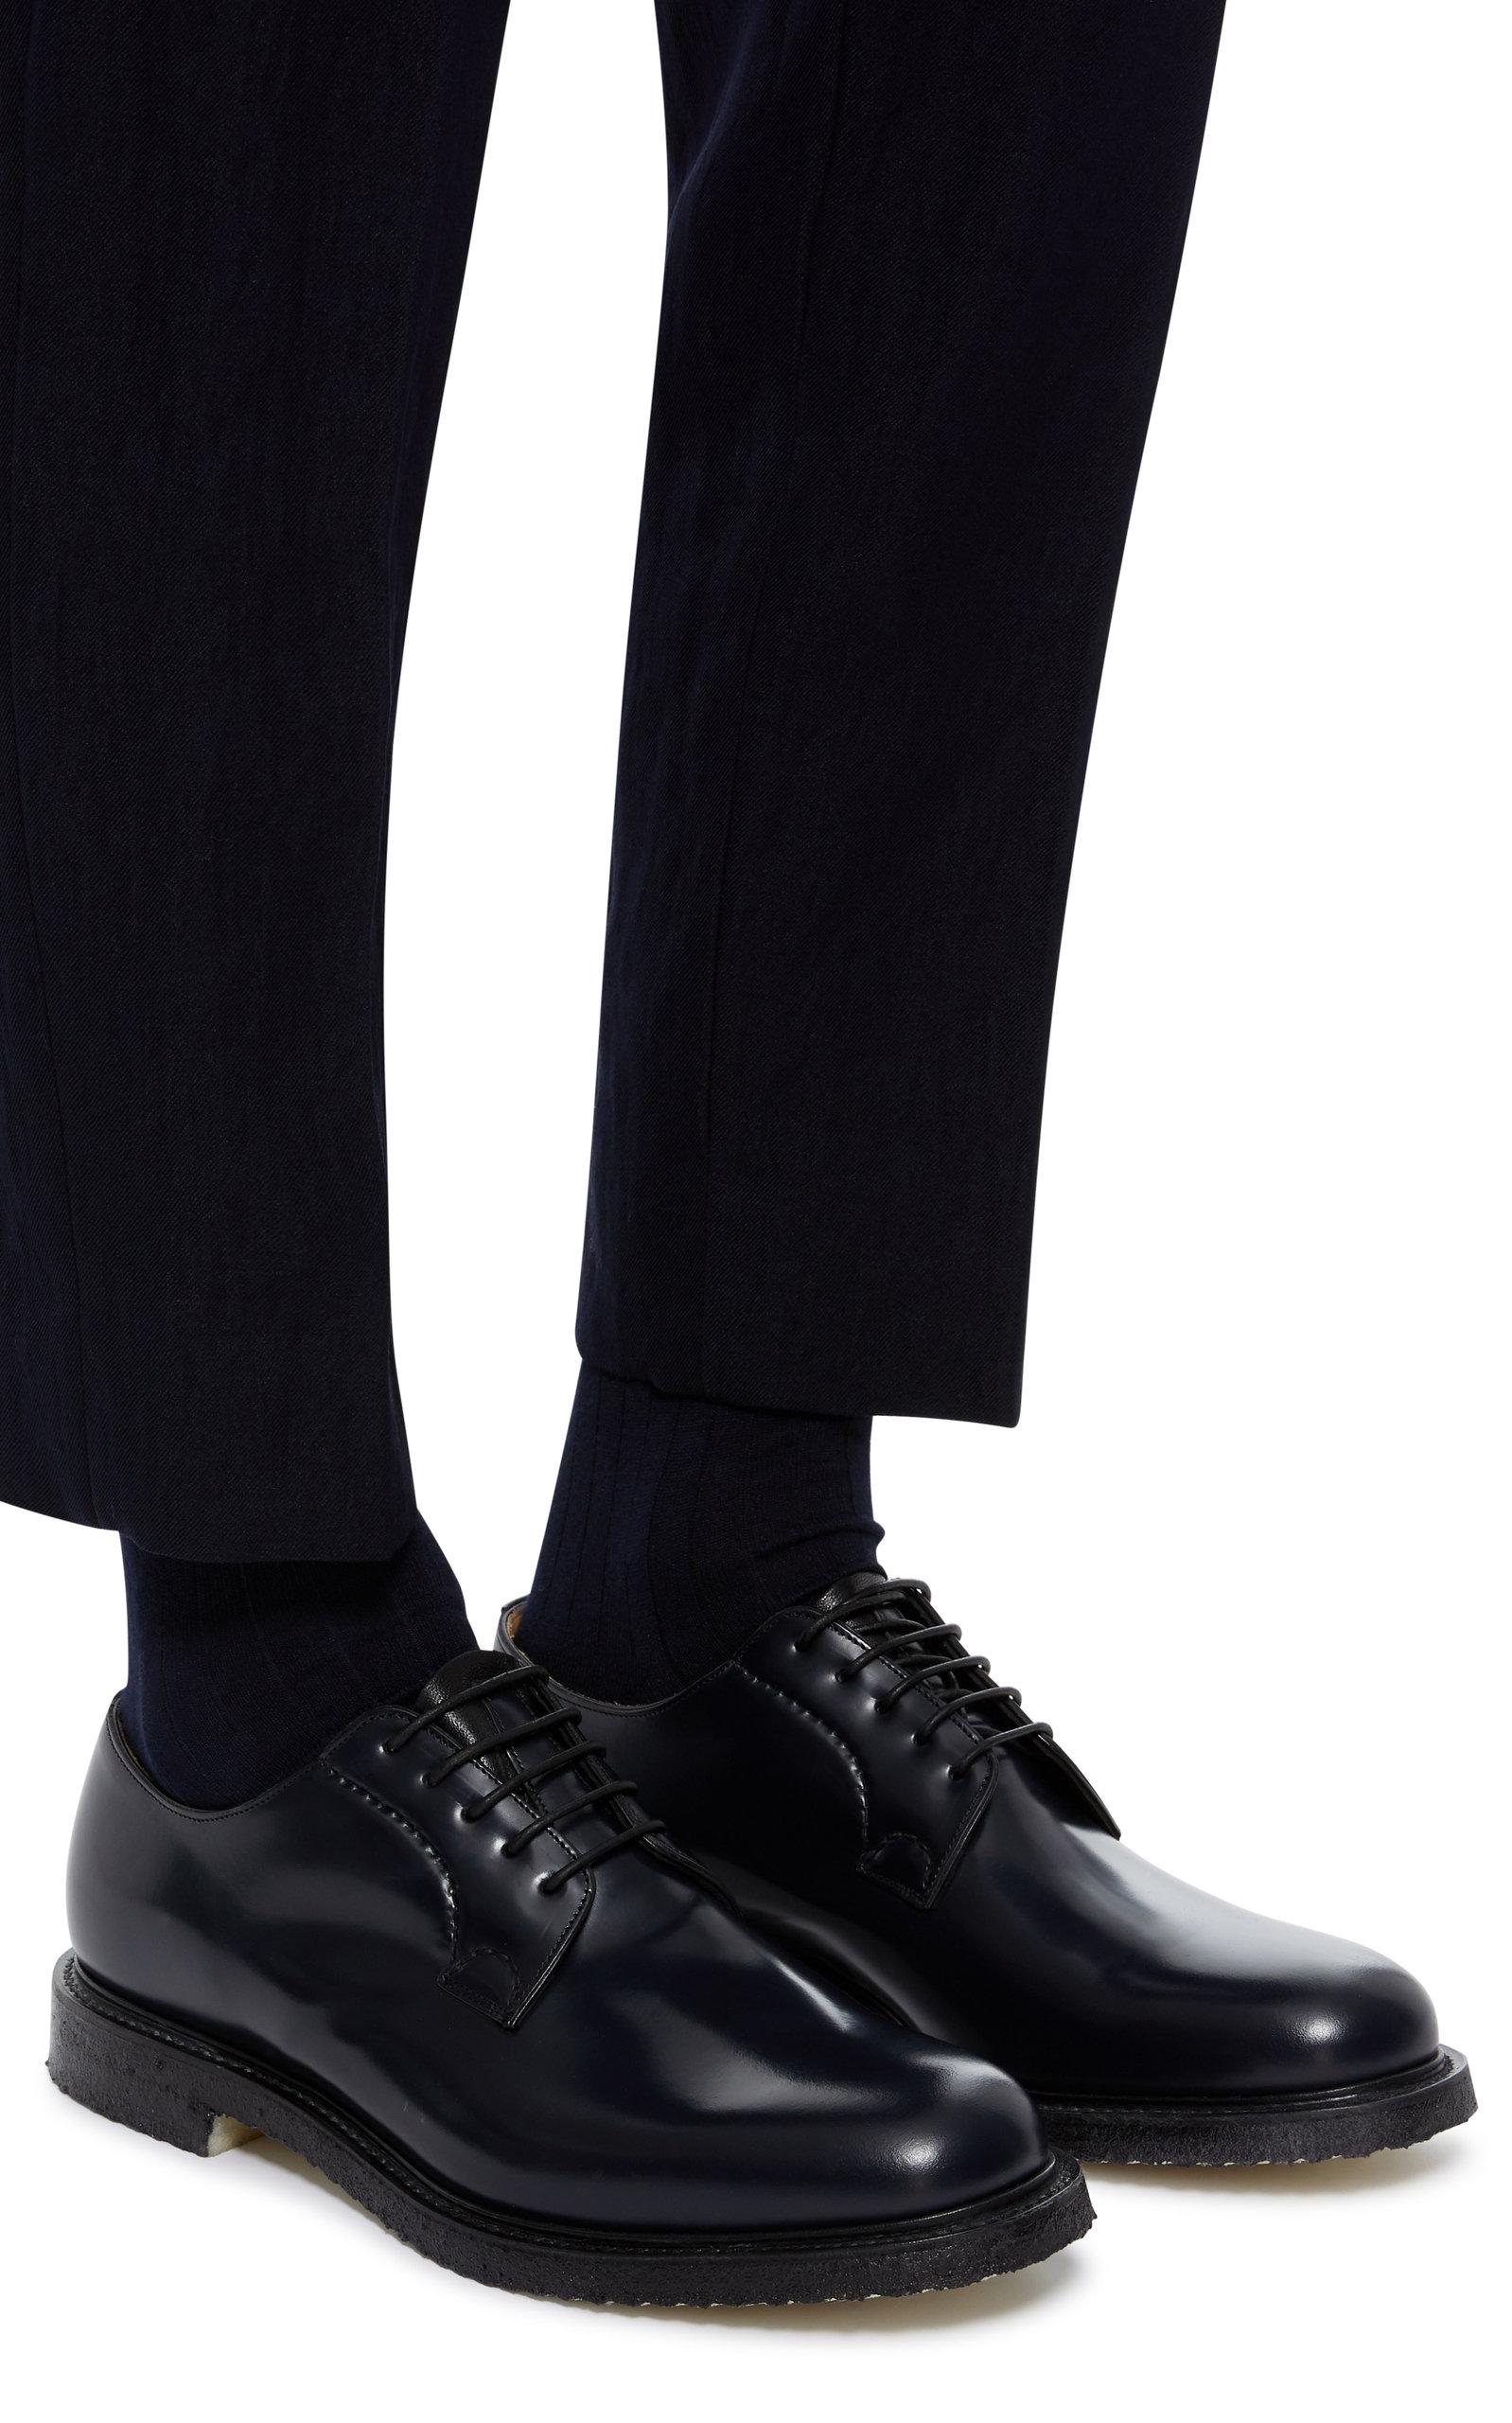 736c383e60bd8 Shannon Leather Derby Shoes by Church's | Moda Operandi